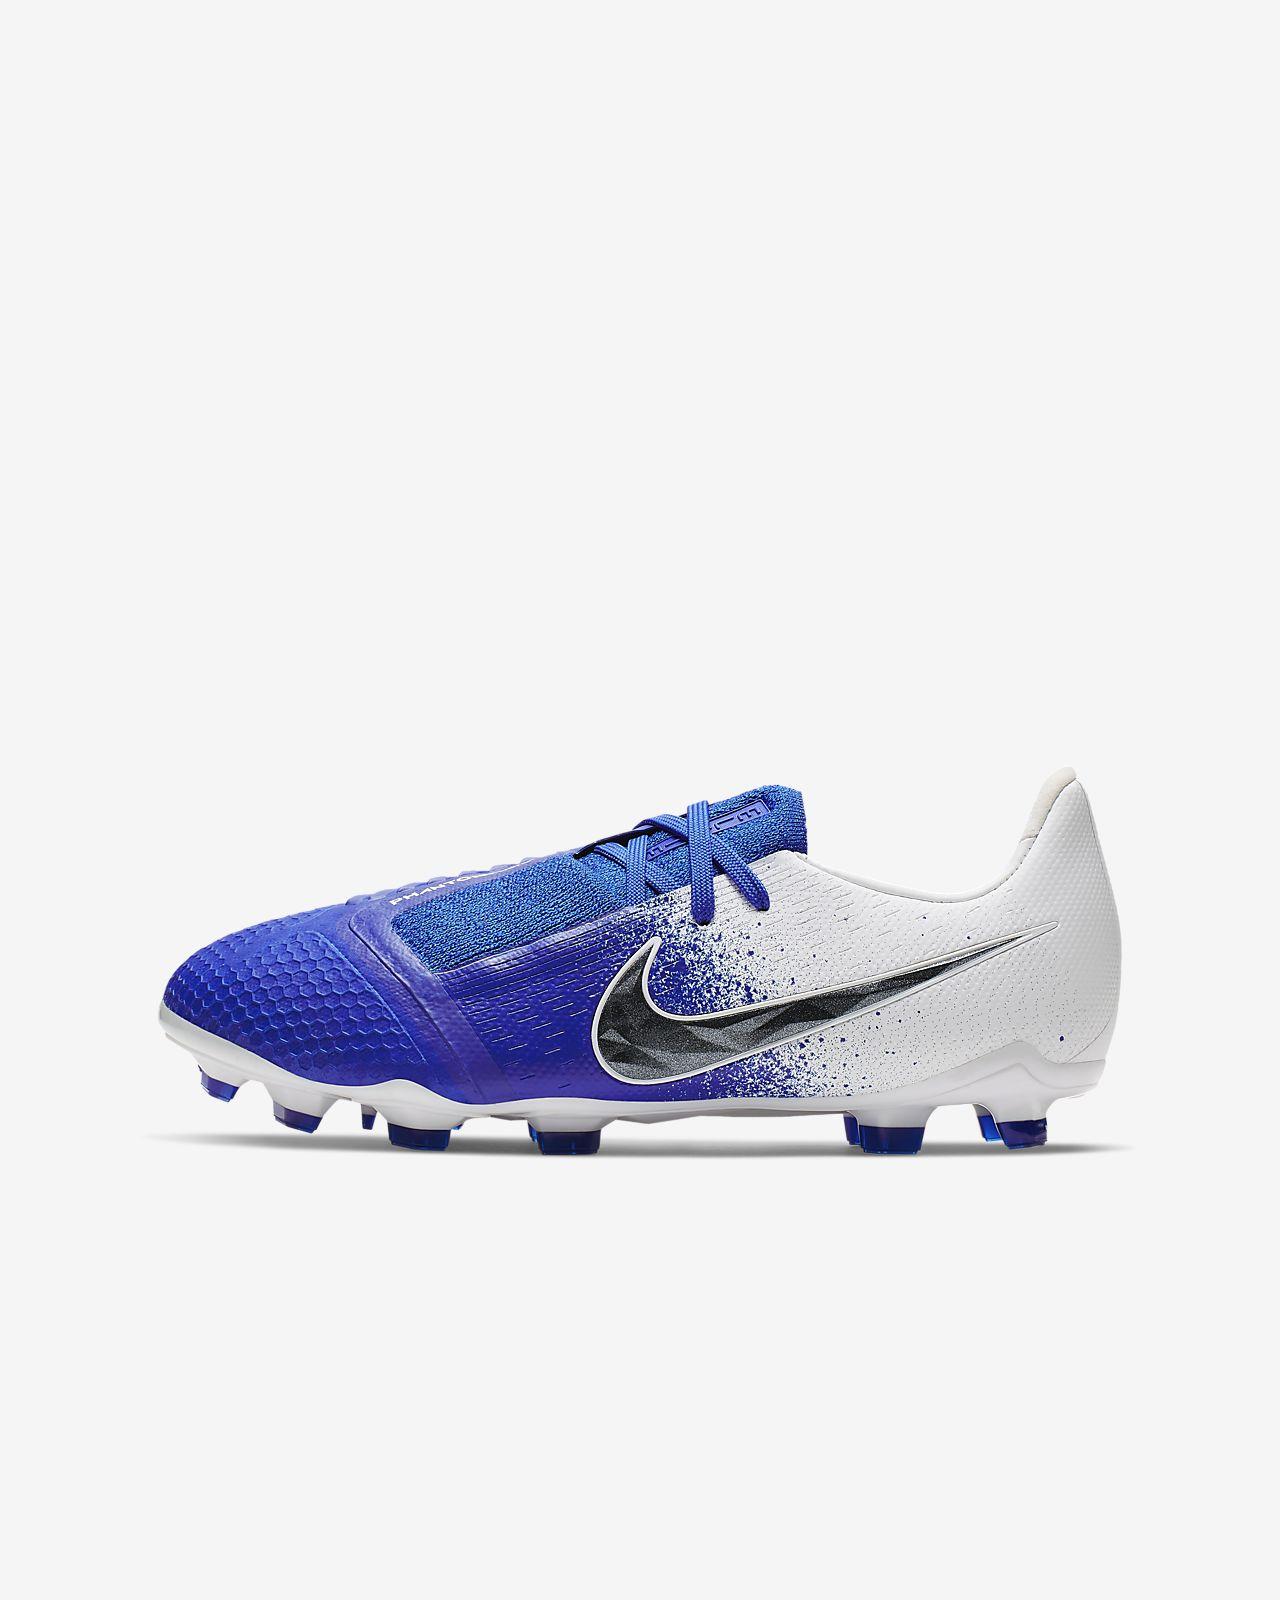 vente chaude en ligne 5dd4b f4b65 en Noir EUR 36.5 Nike Mercurial chaussures de football ...